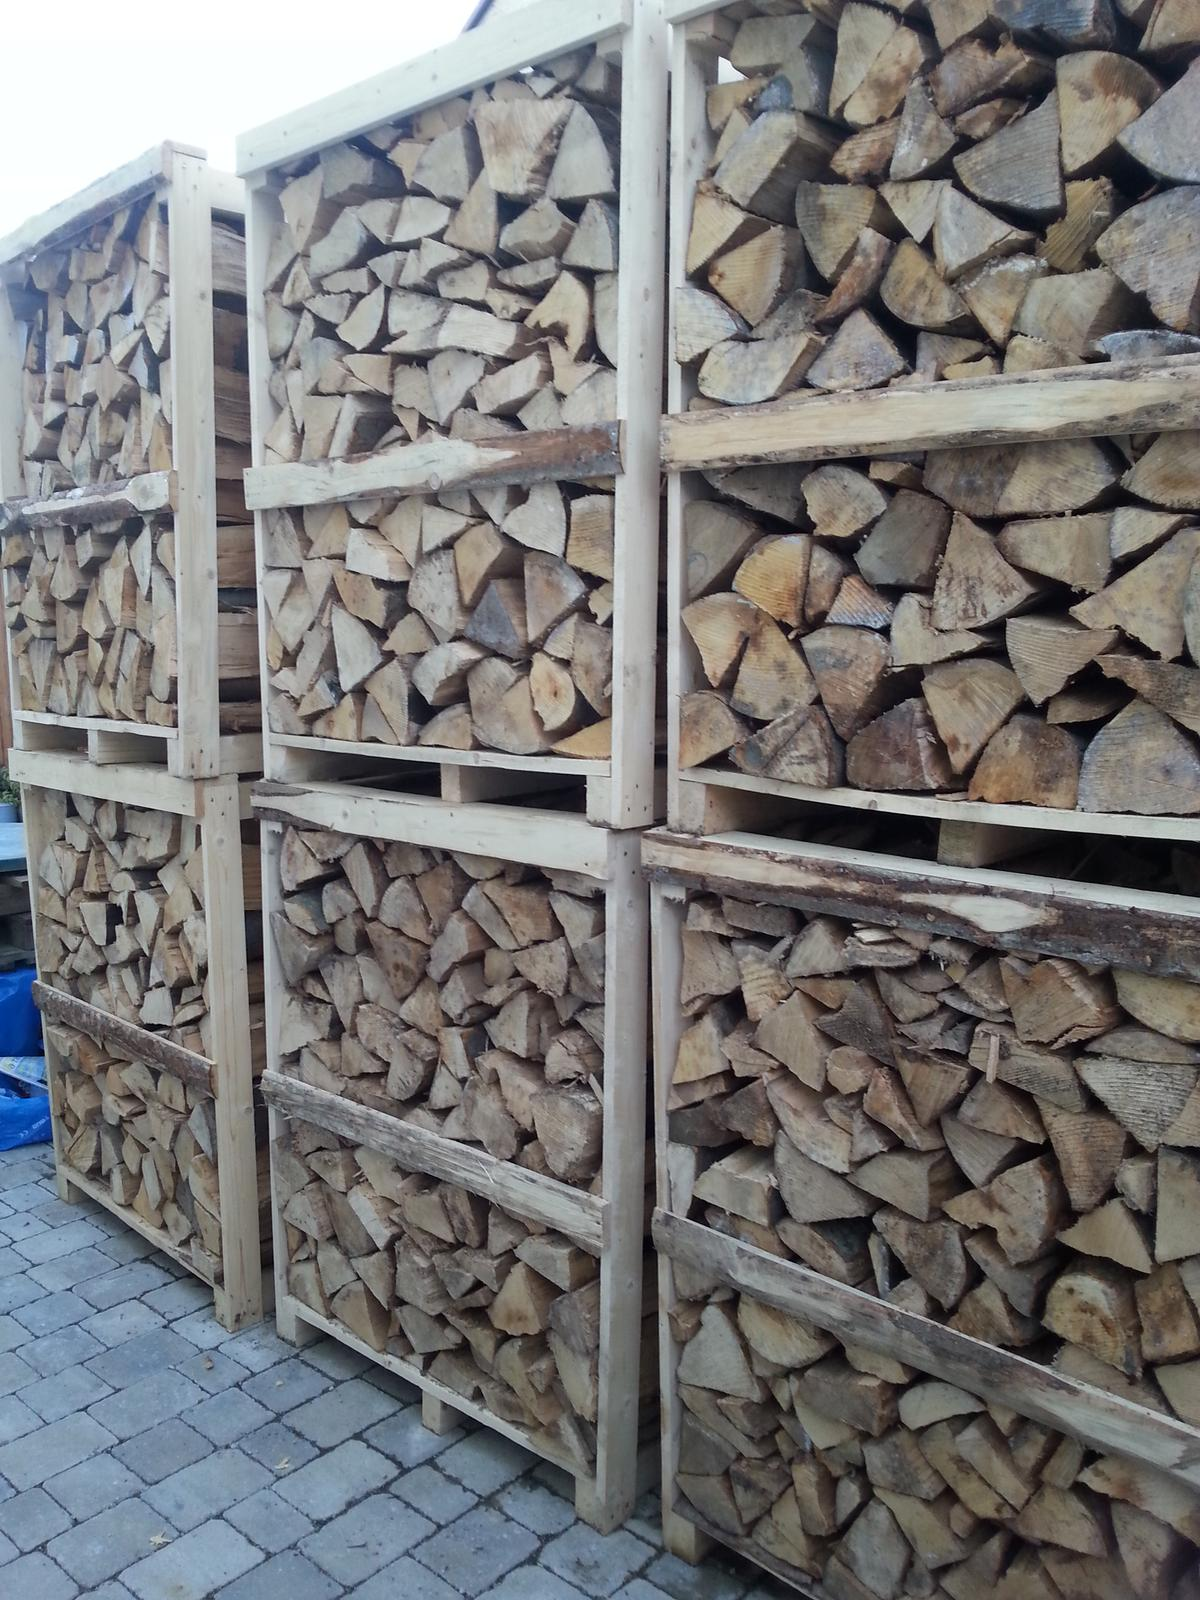 U nás - v malom dome :-) - dreva bude hadam dost :-)